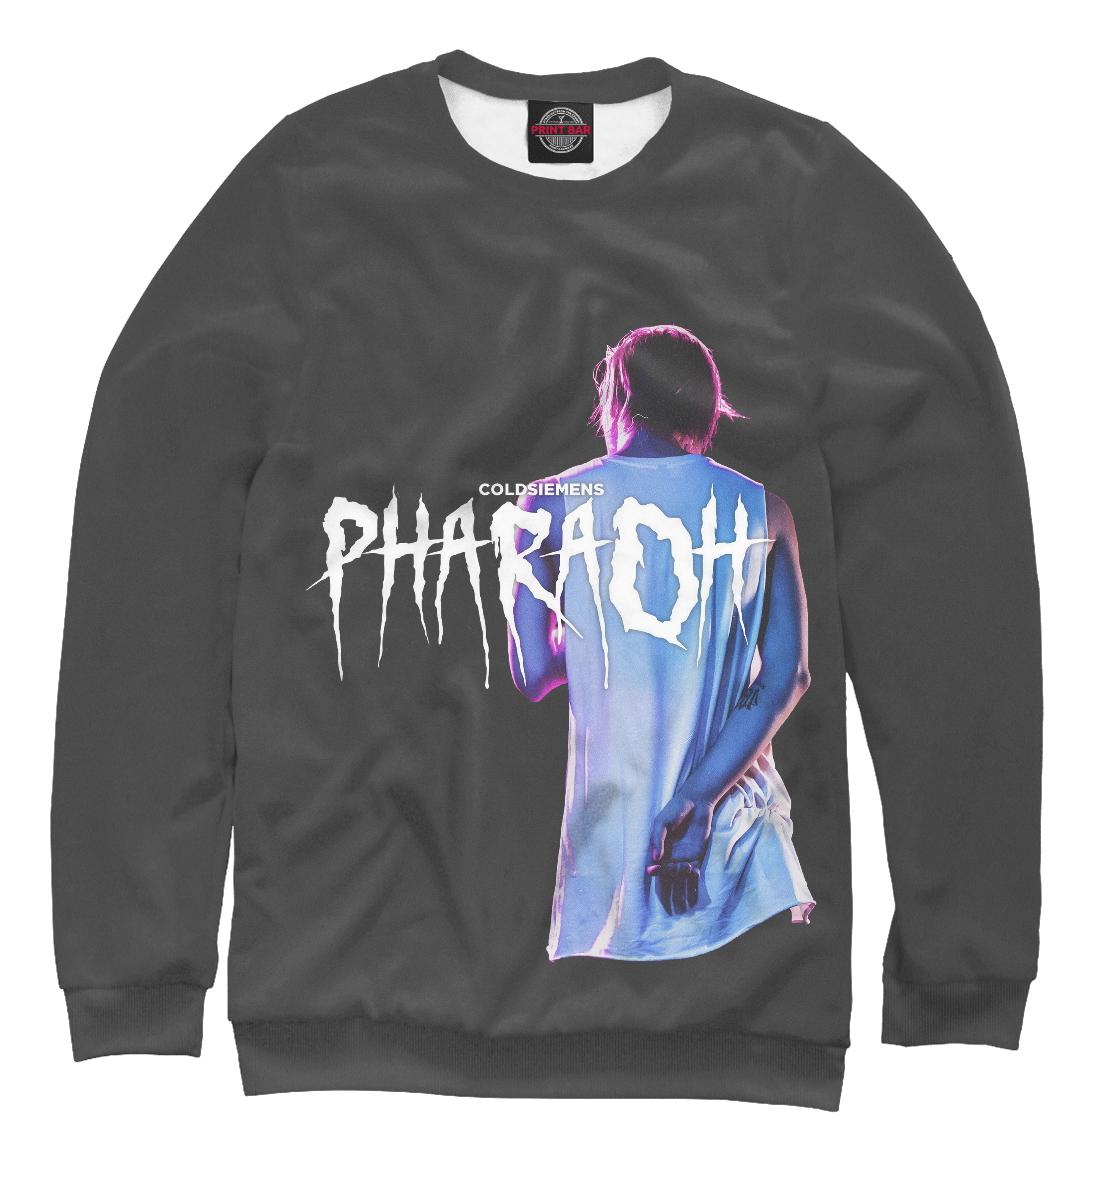 Pharaoh / Coldsiemens Printbar